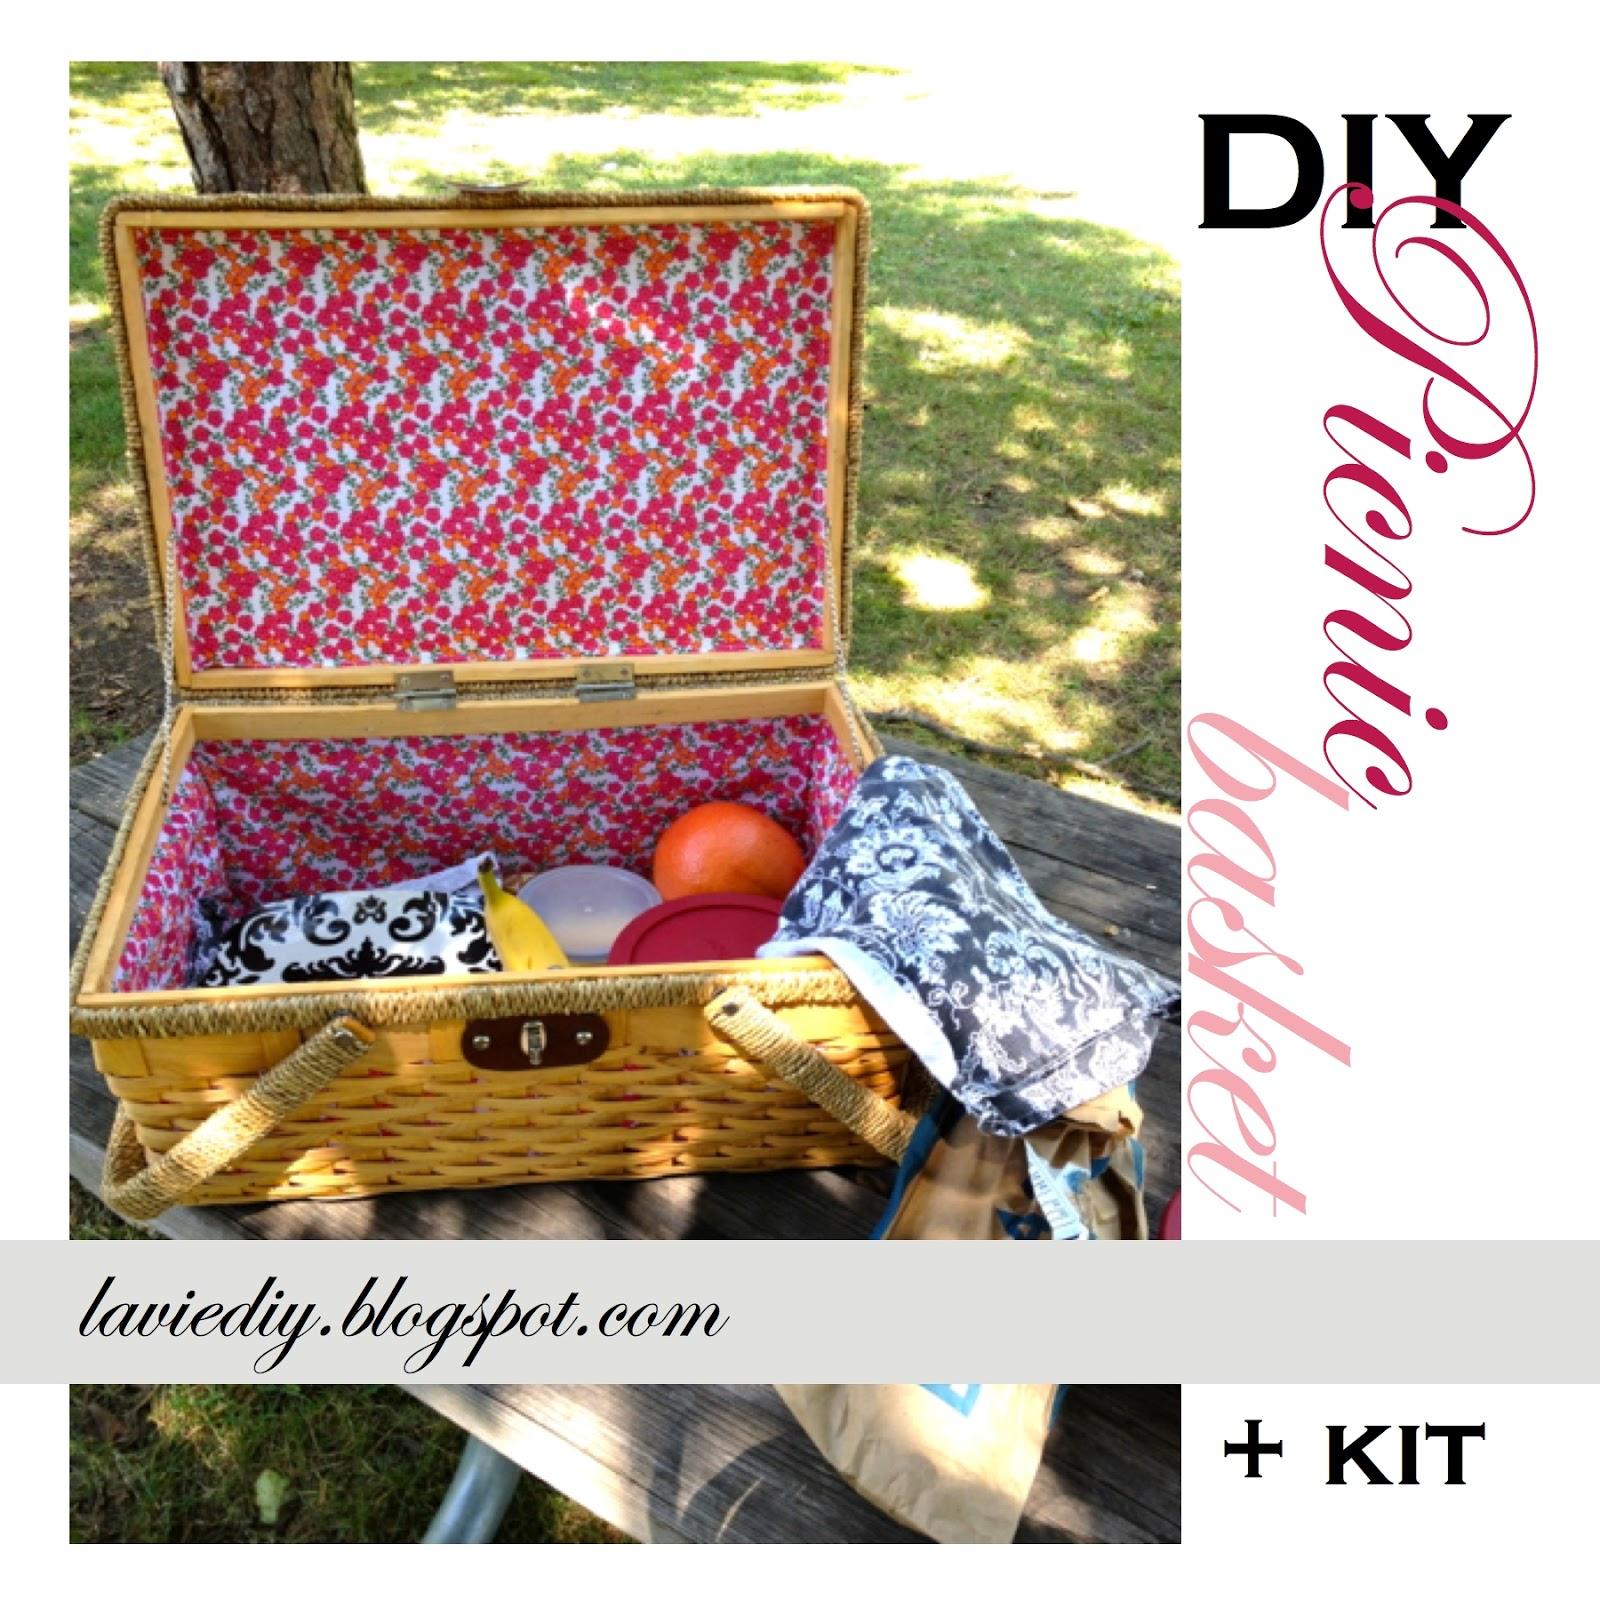 Picnic Basket Kit : La vie diy picnic basket kit